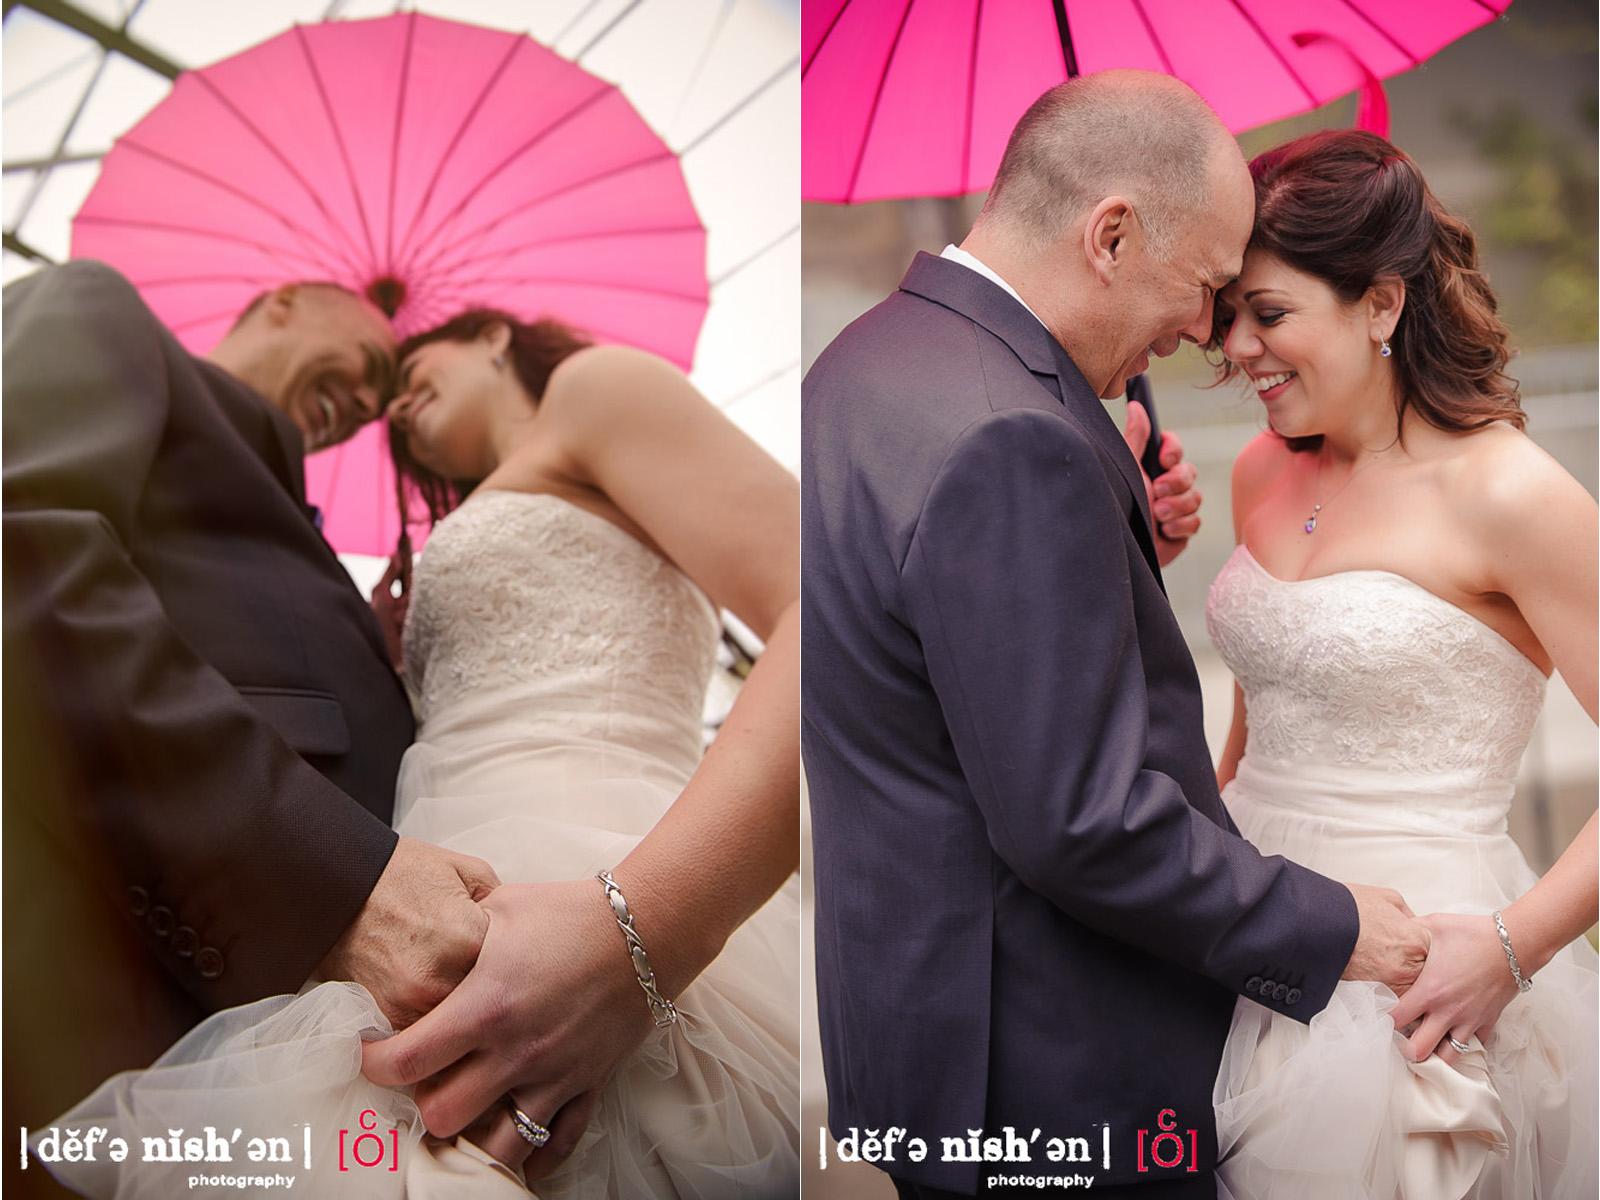 Definition Photography Weddings Globe Danforth-1014.jpg